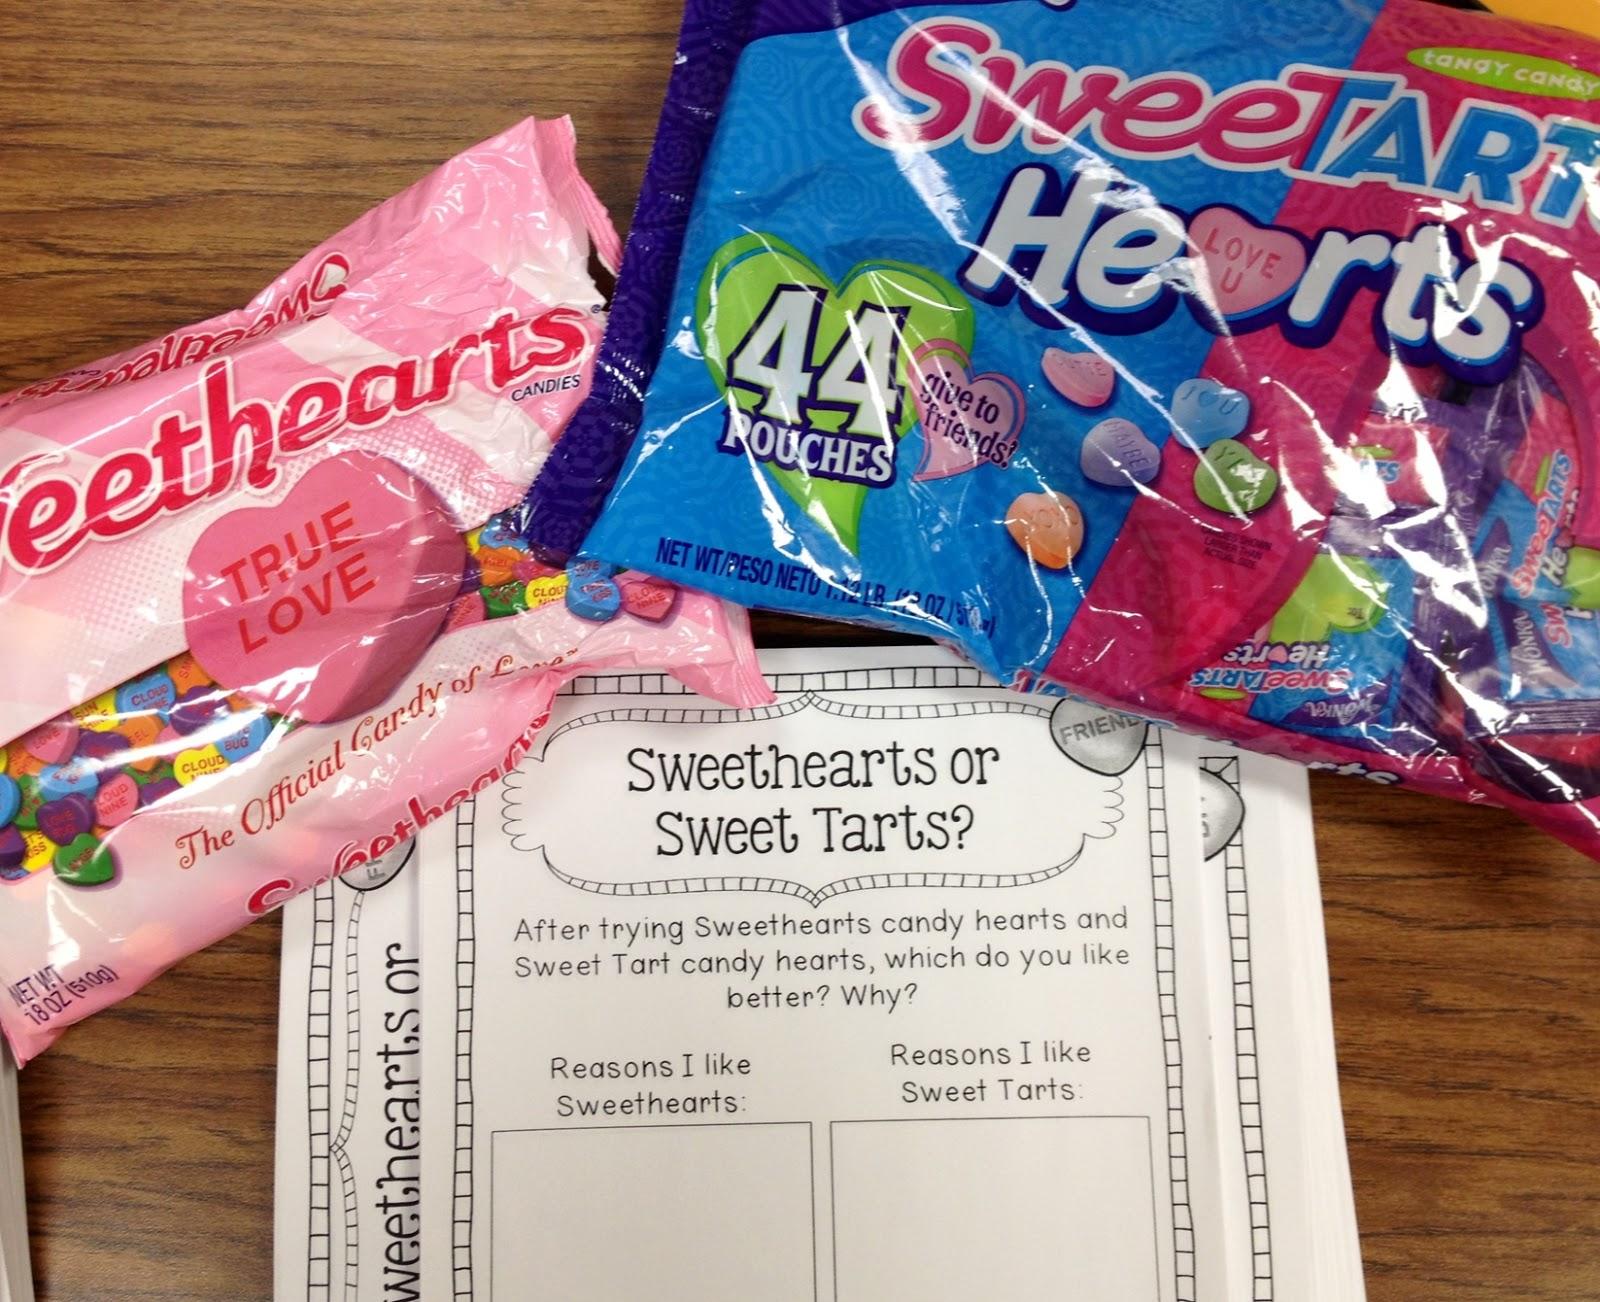 Susan Jones Teaching Sweethearts Or Sweet Tarts What S Your Opinion